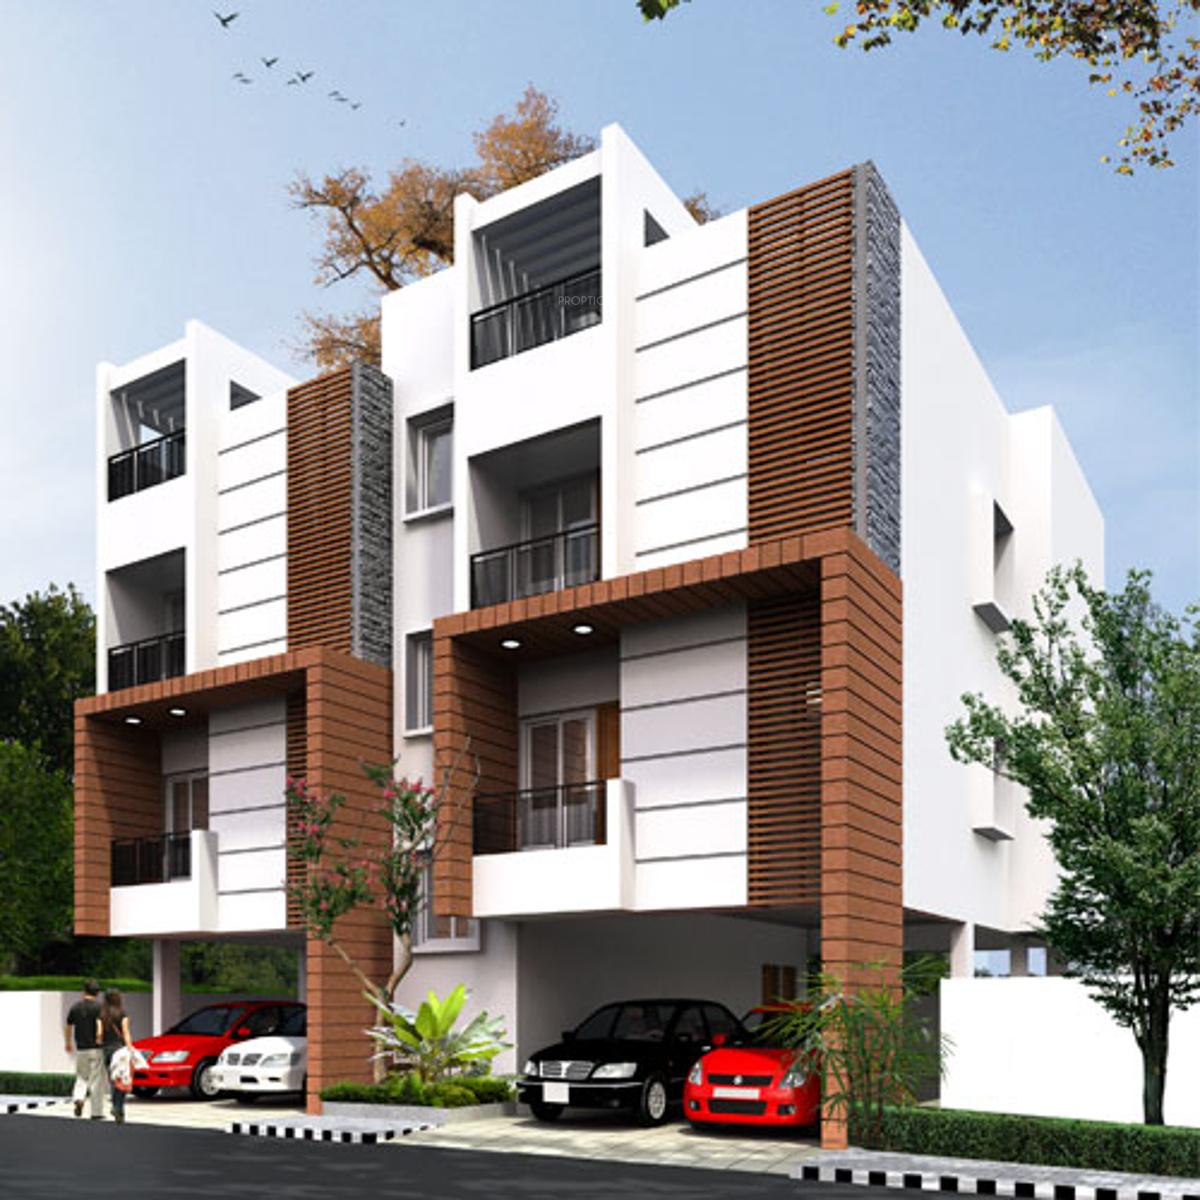 Apartment Price: Malles Akankssha Apartment In Perumbakkam, Chennai